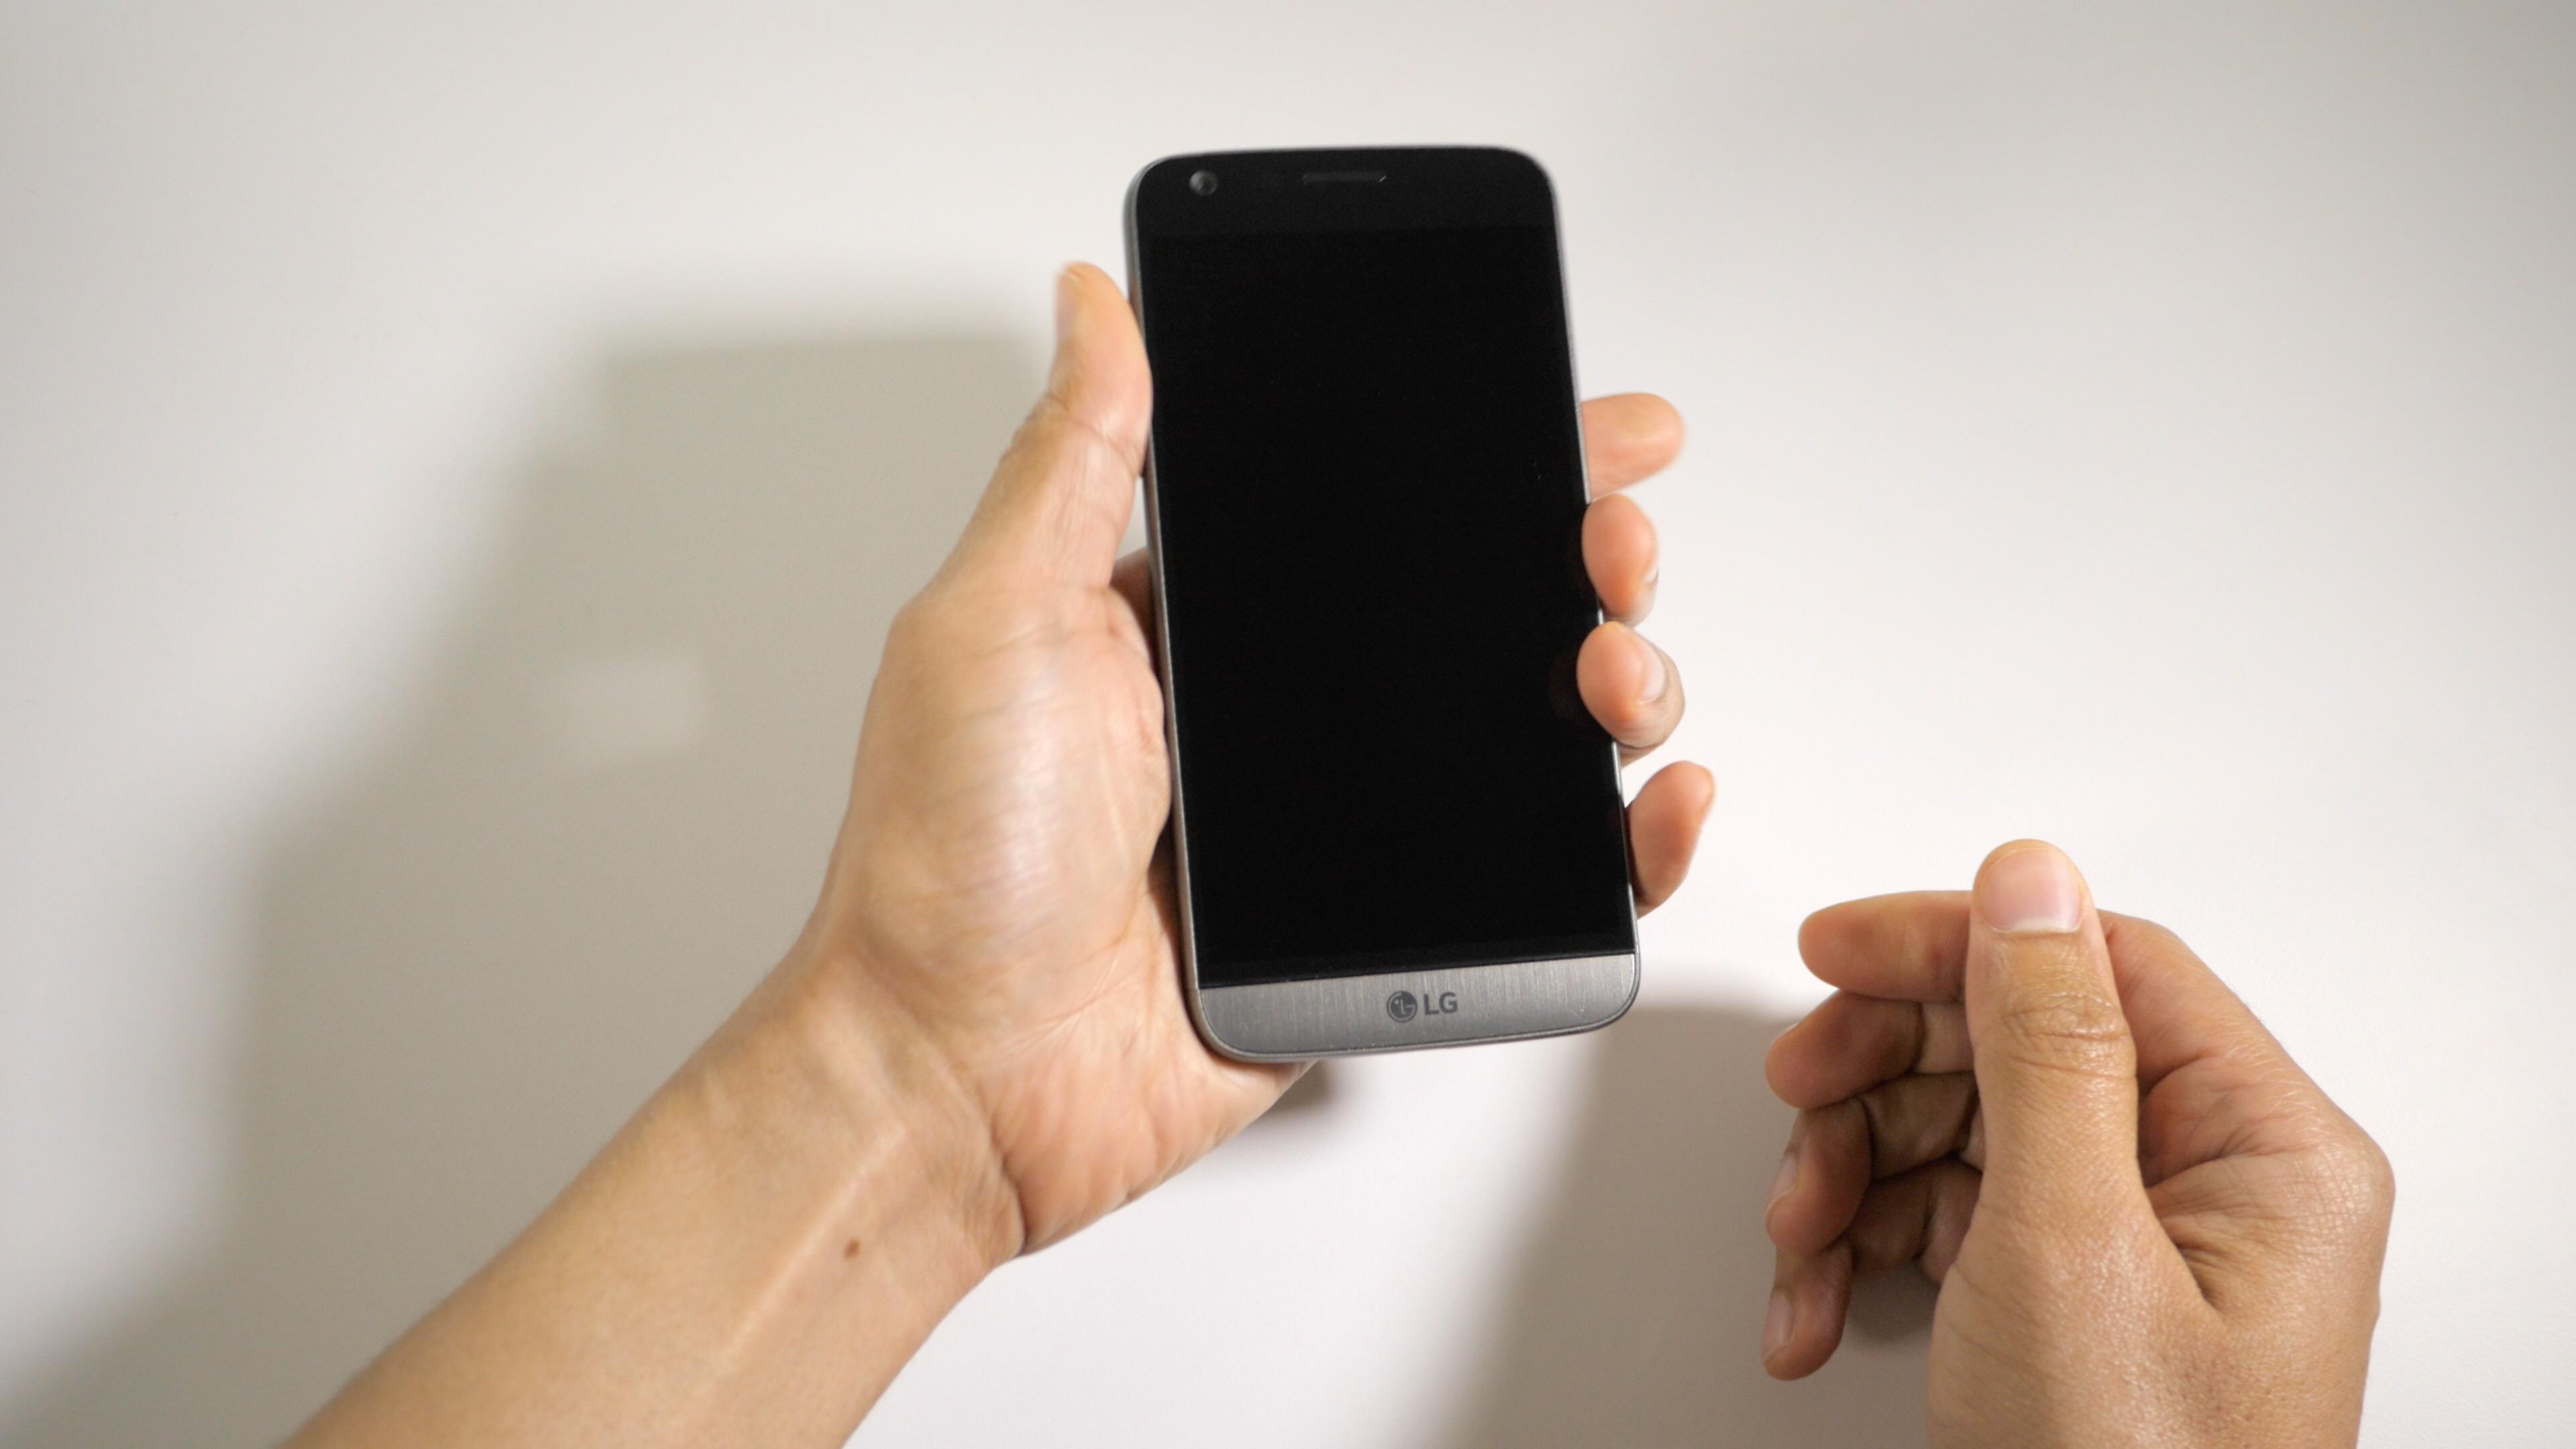 LG G5 Screen